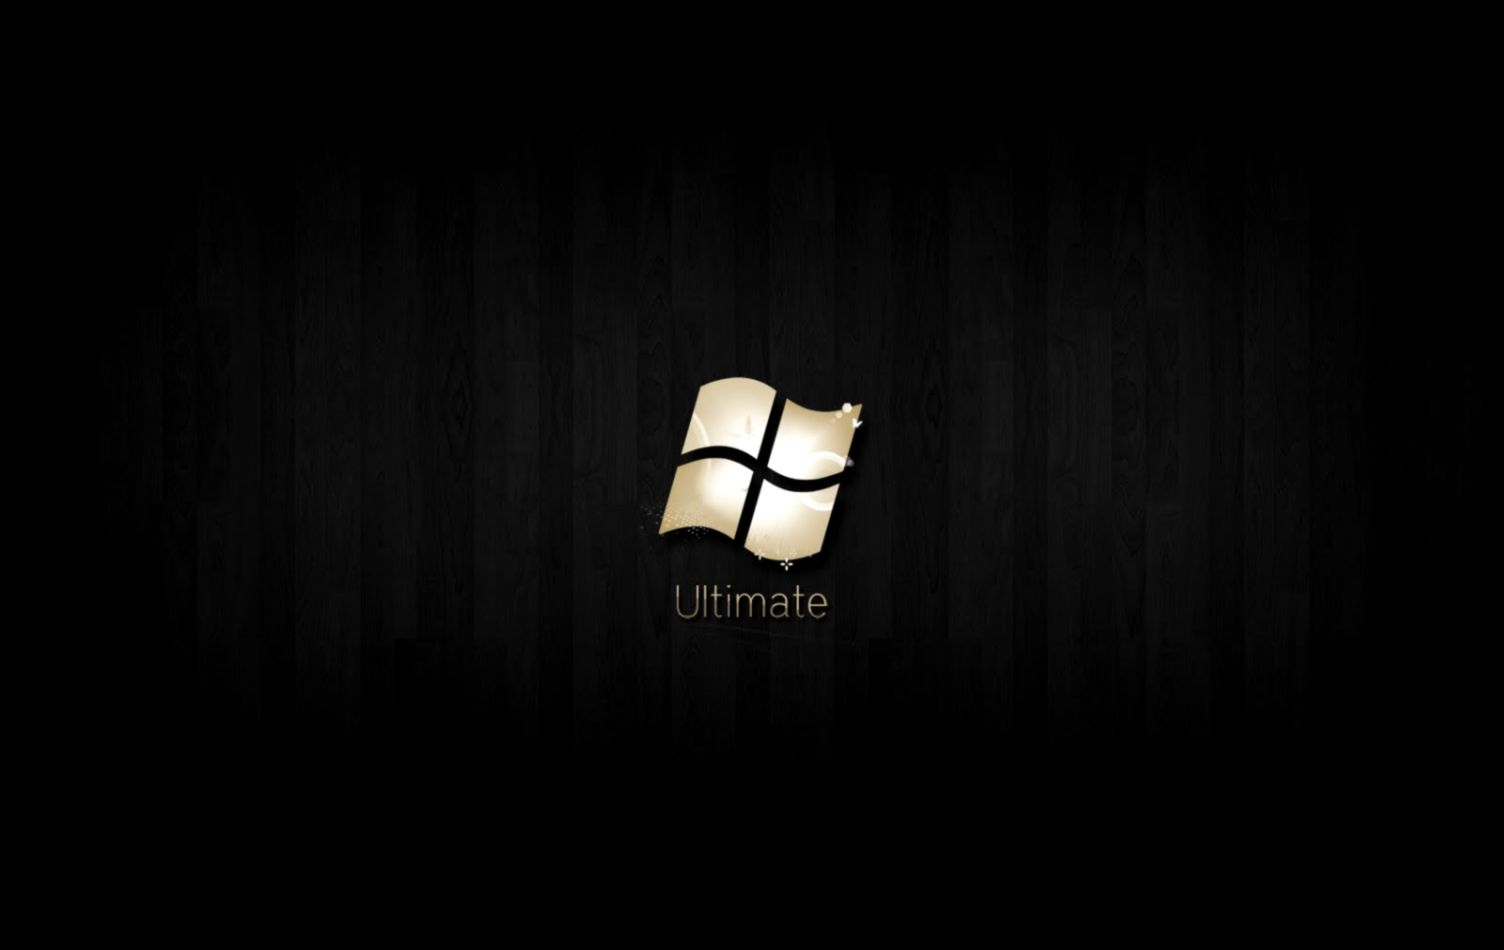 Windows 8 Red Logo Black Hd Background Desktop